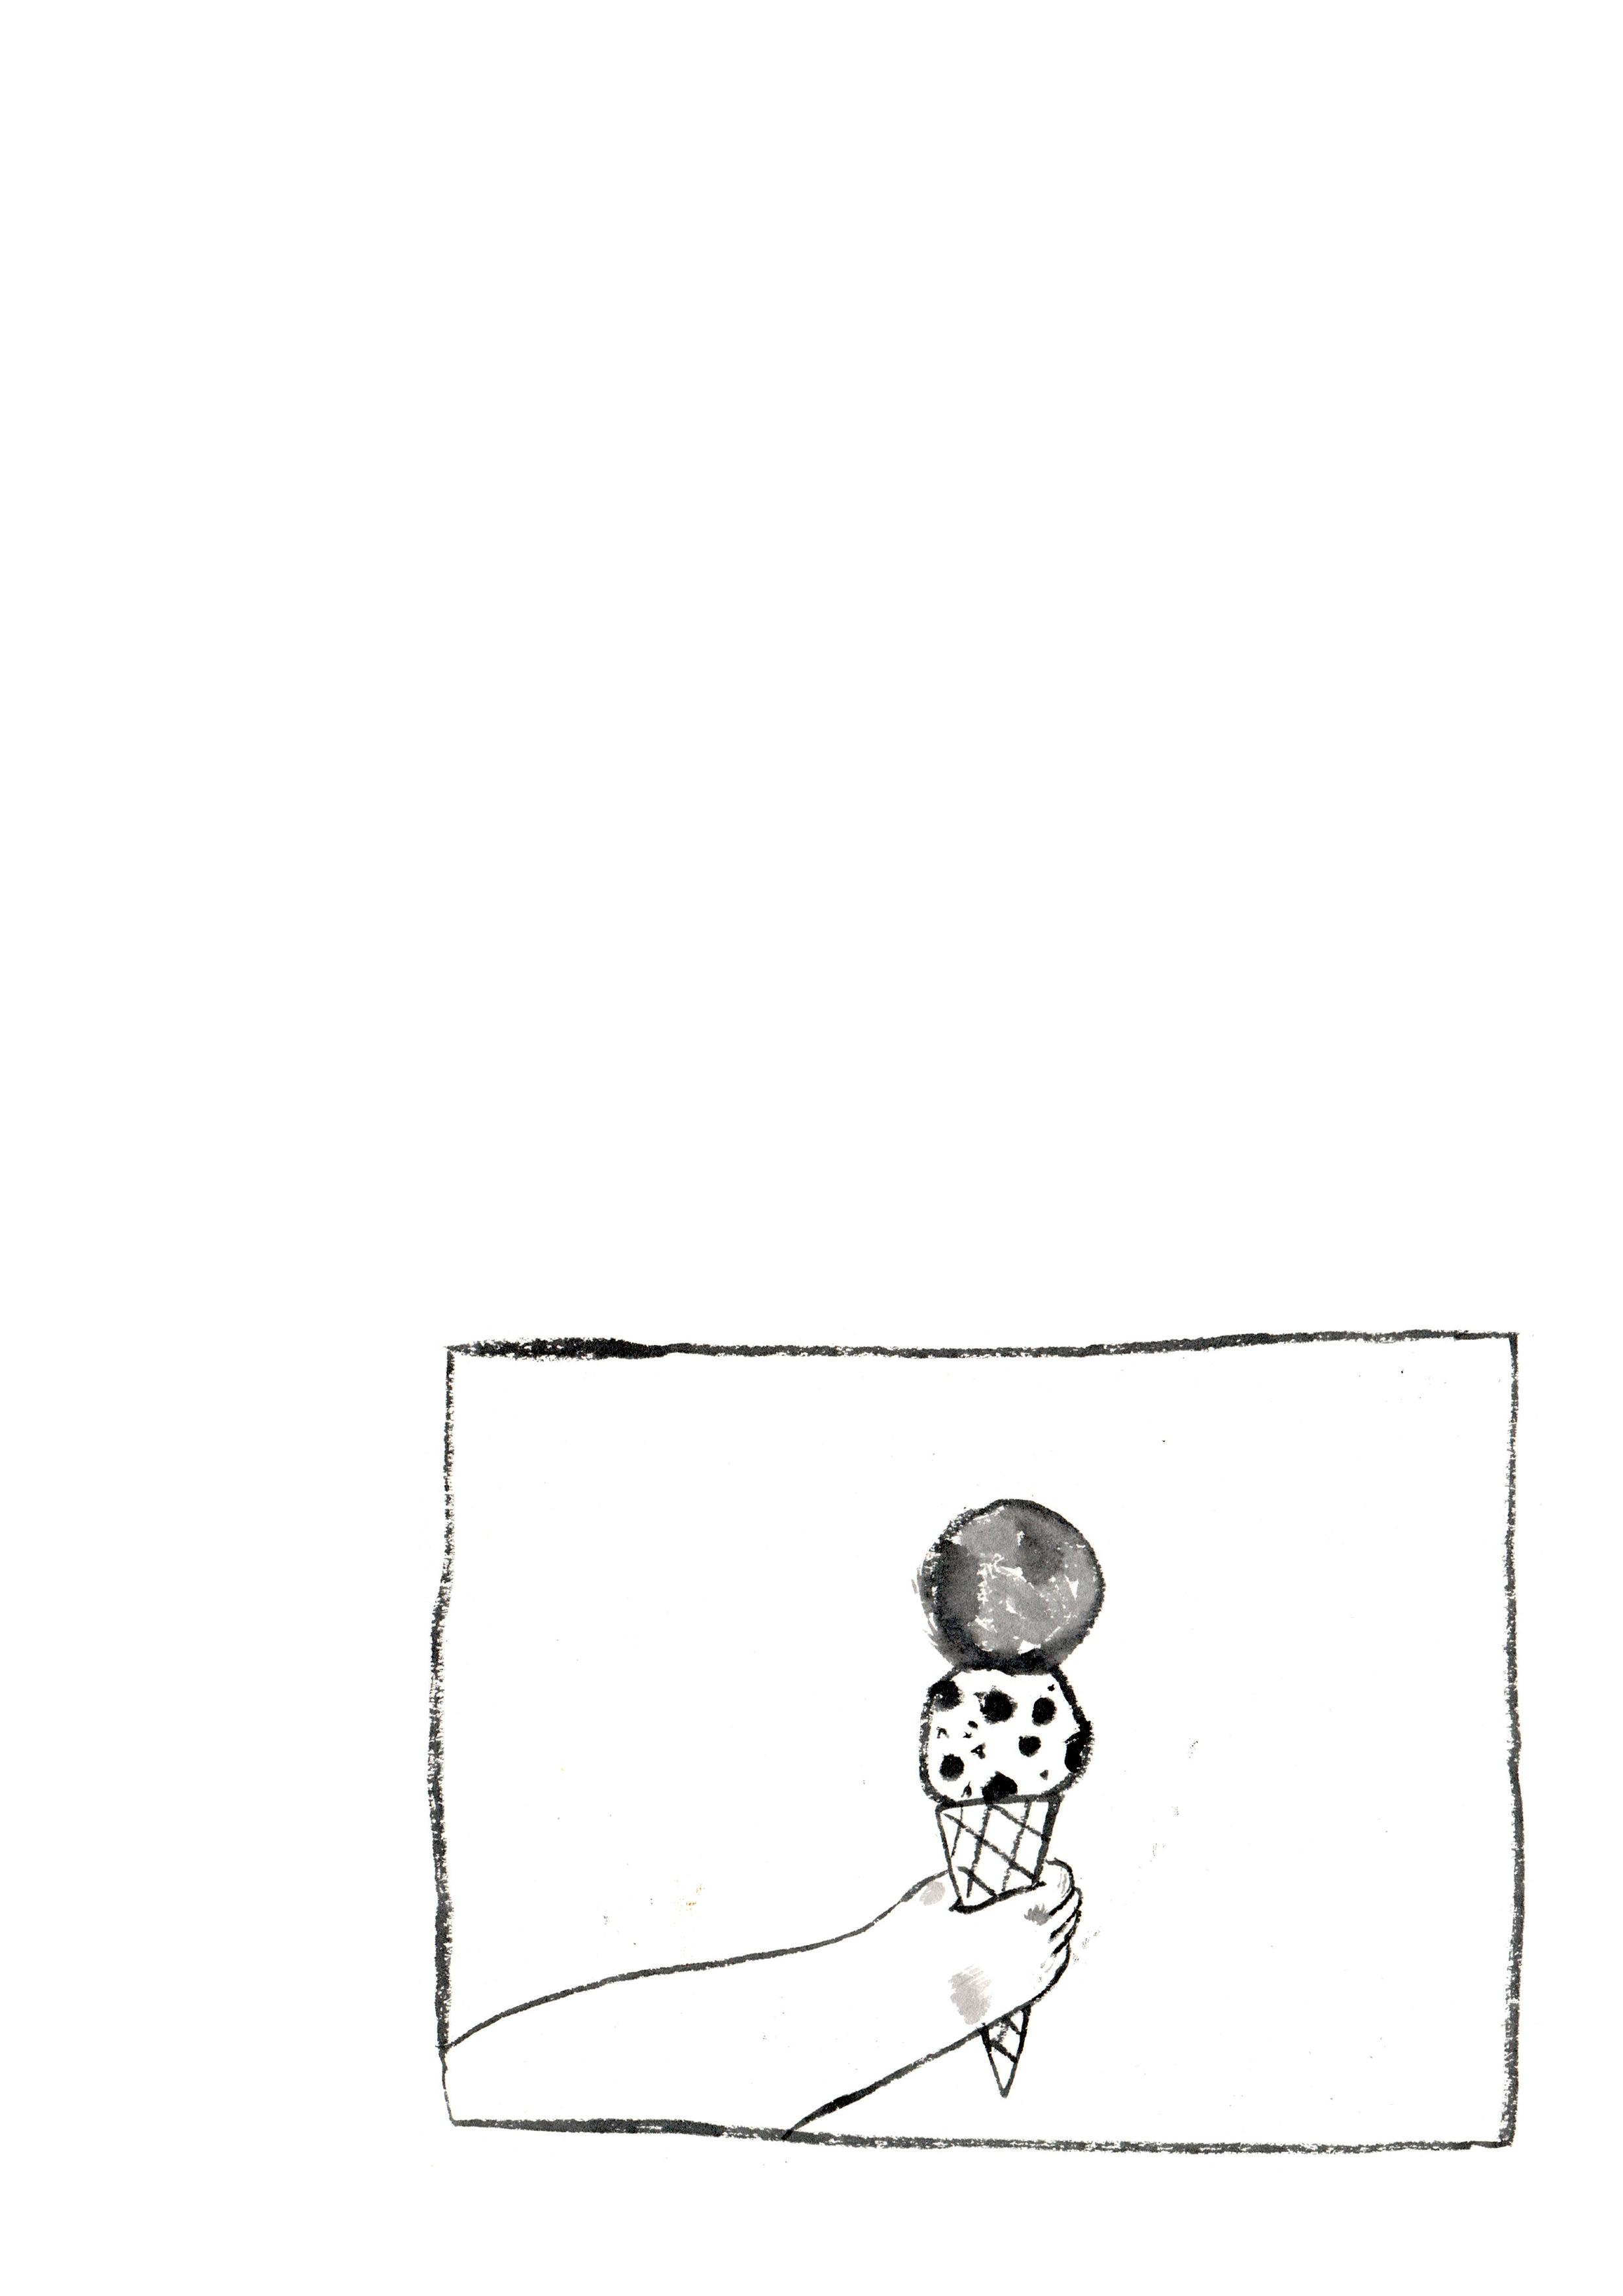 abrantes comic 8 left.jpg